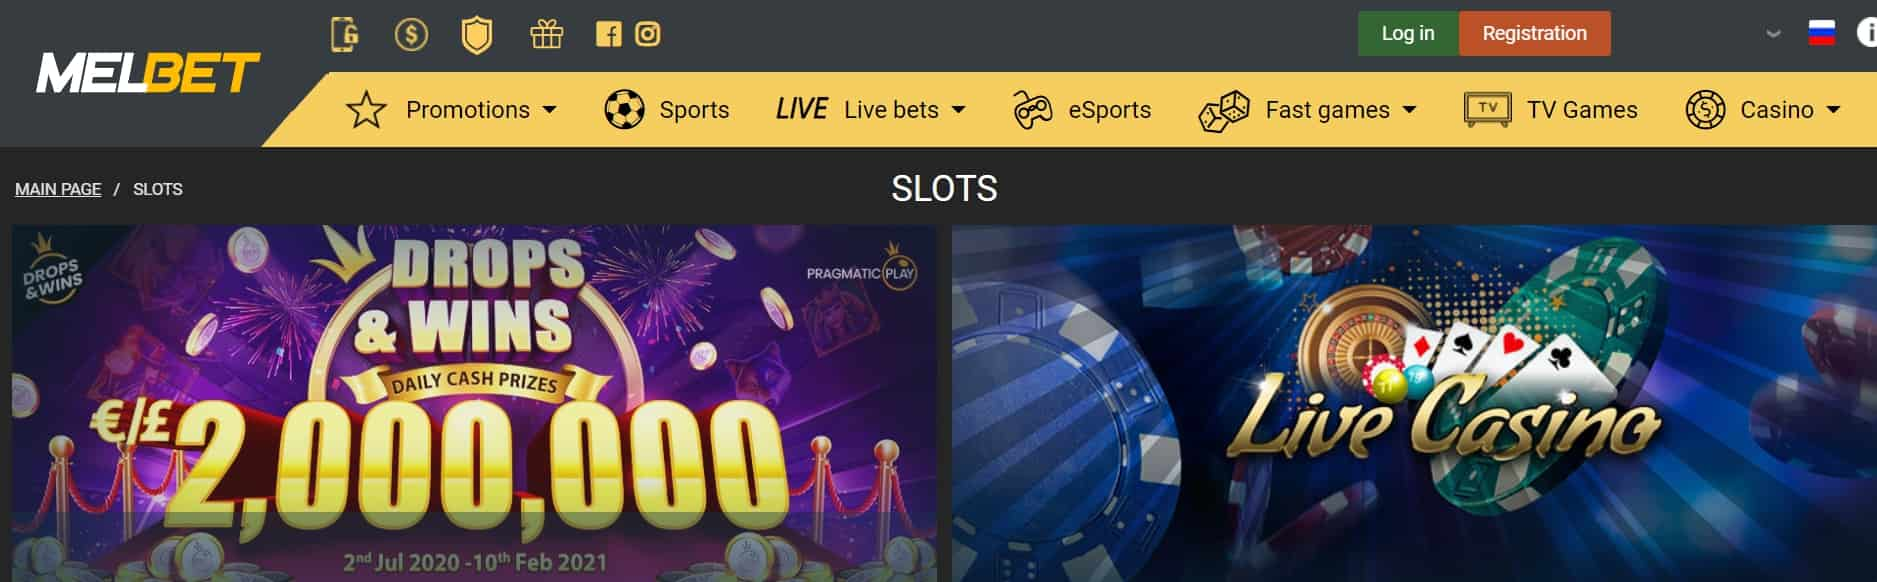 slovenske online kasino